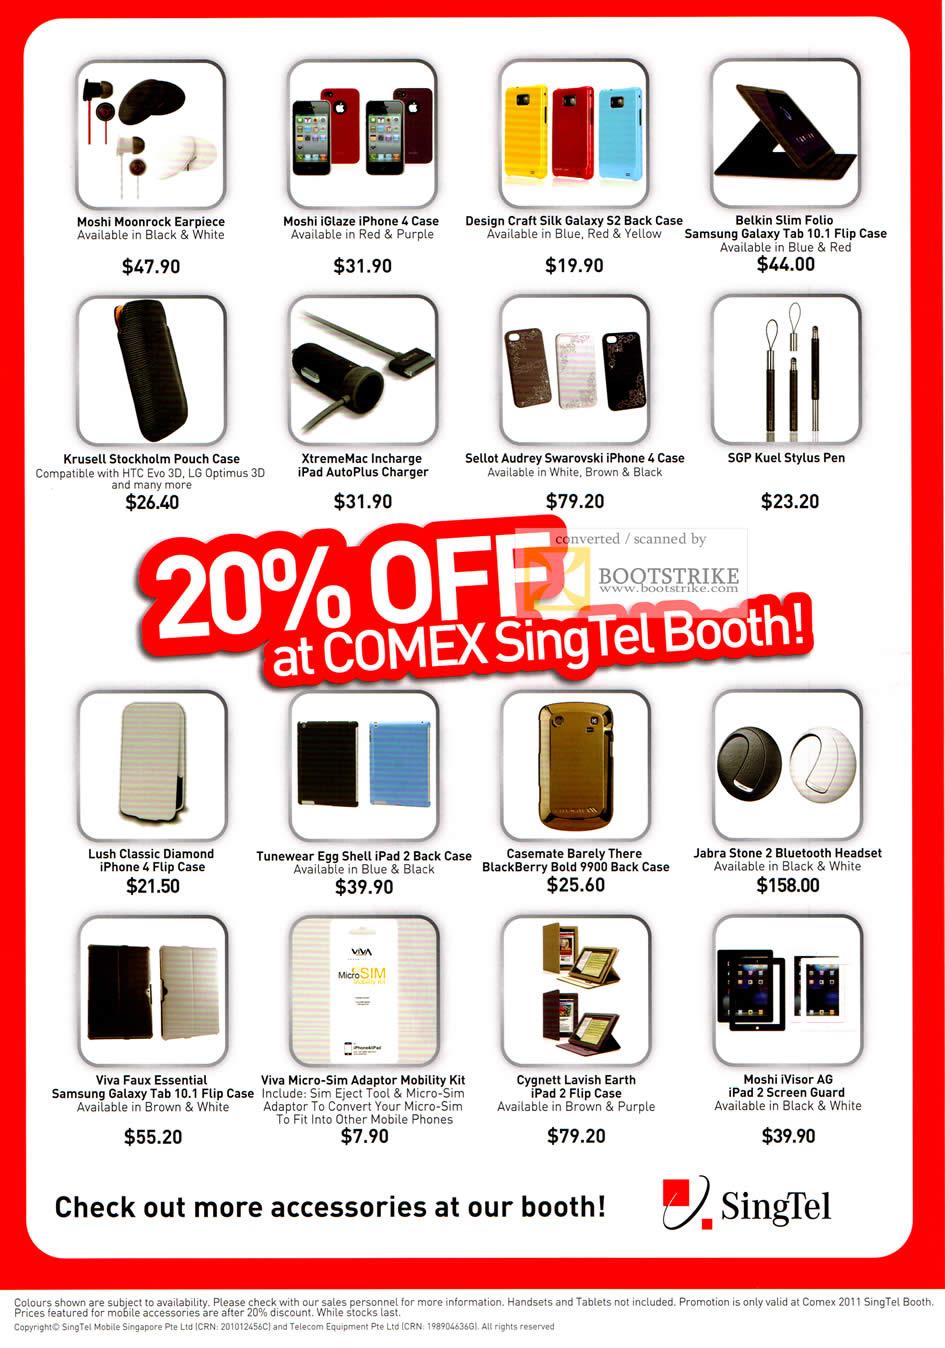 COMEX 2011 Price List Image Brochure Of Singtel Accessories Moshi Moonrock Earpiece IPhone 4 Case Design